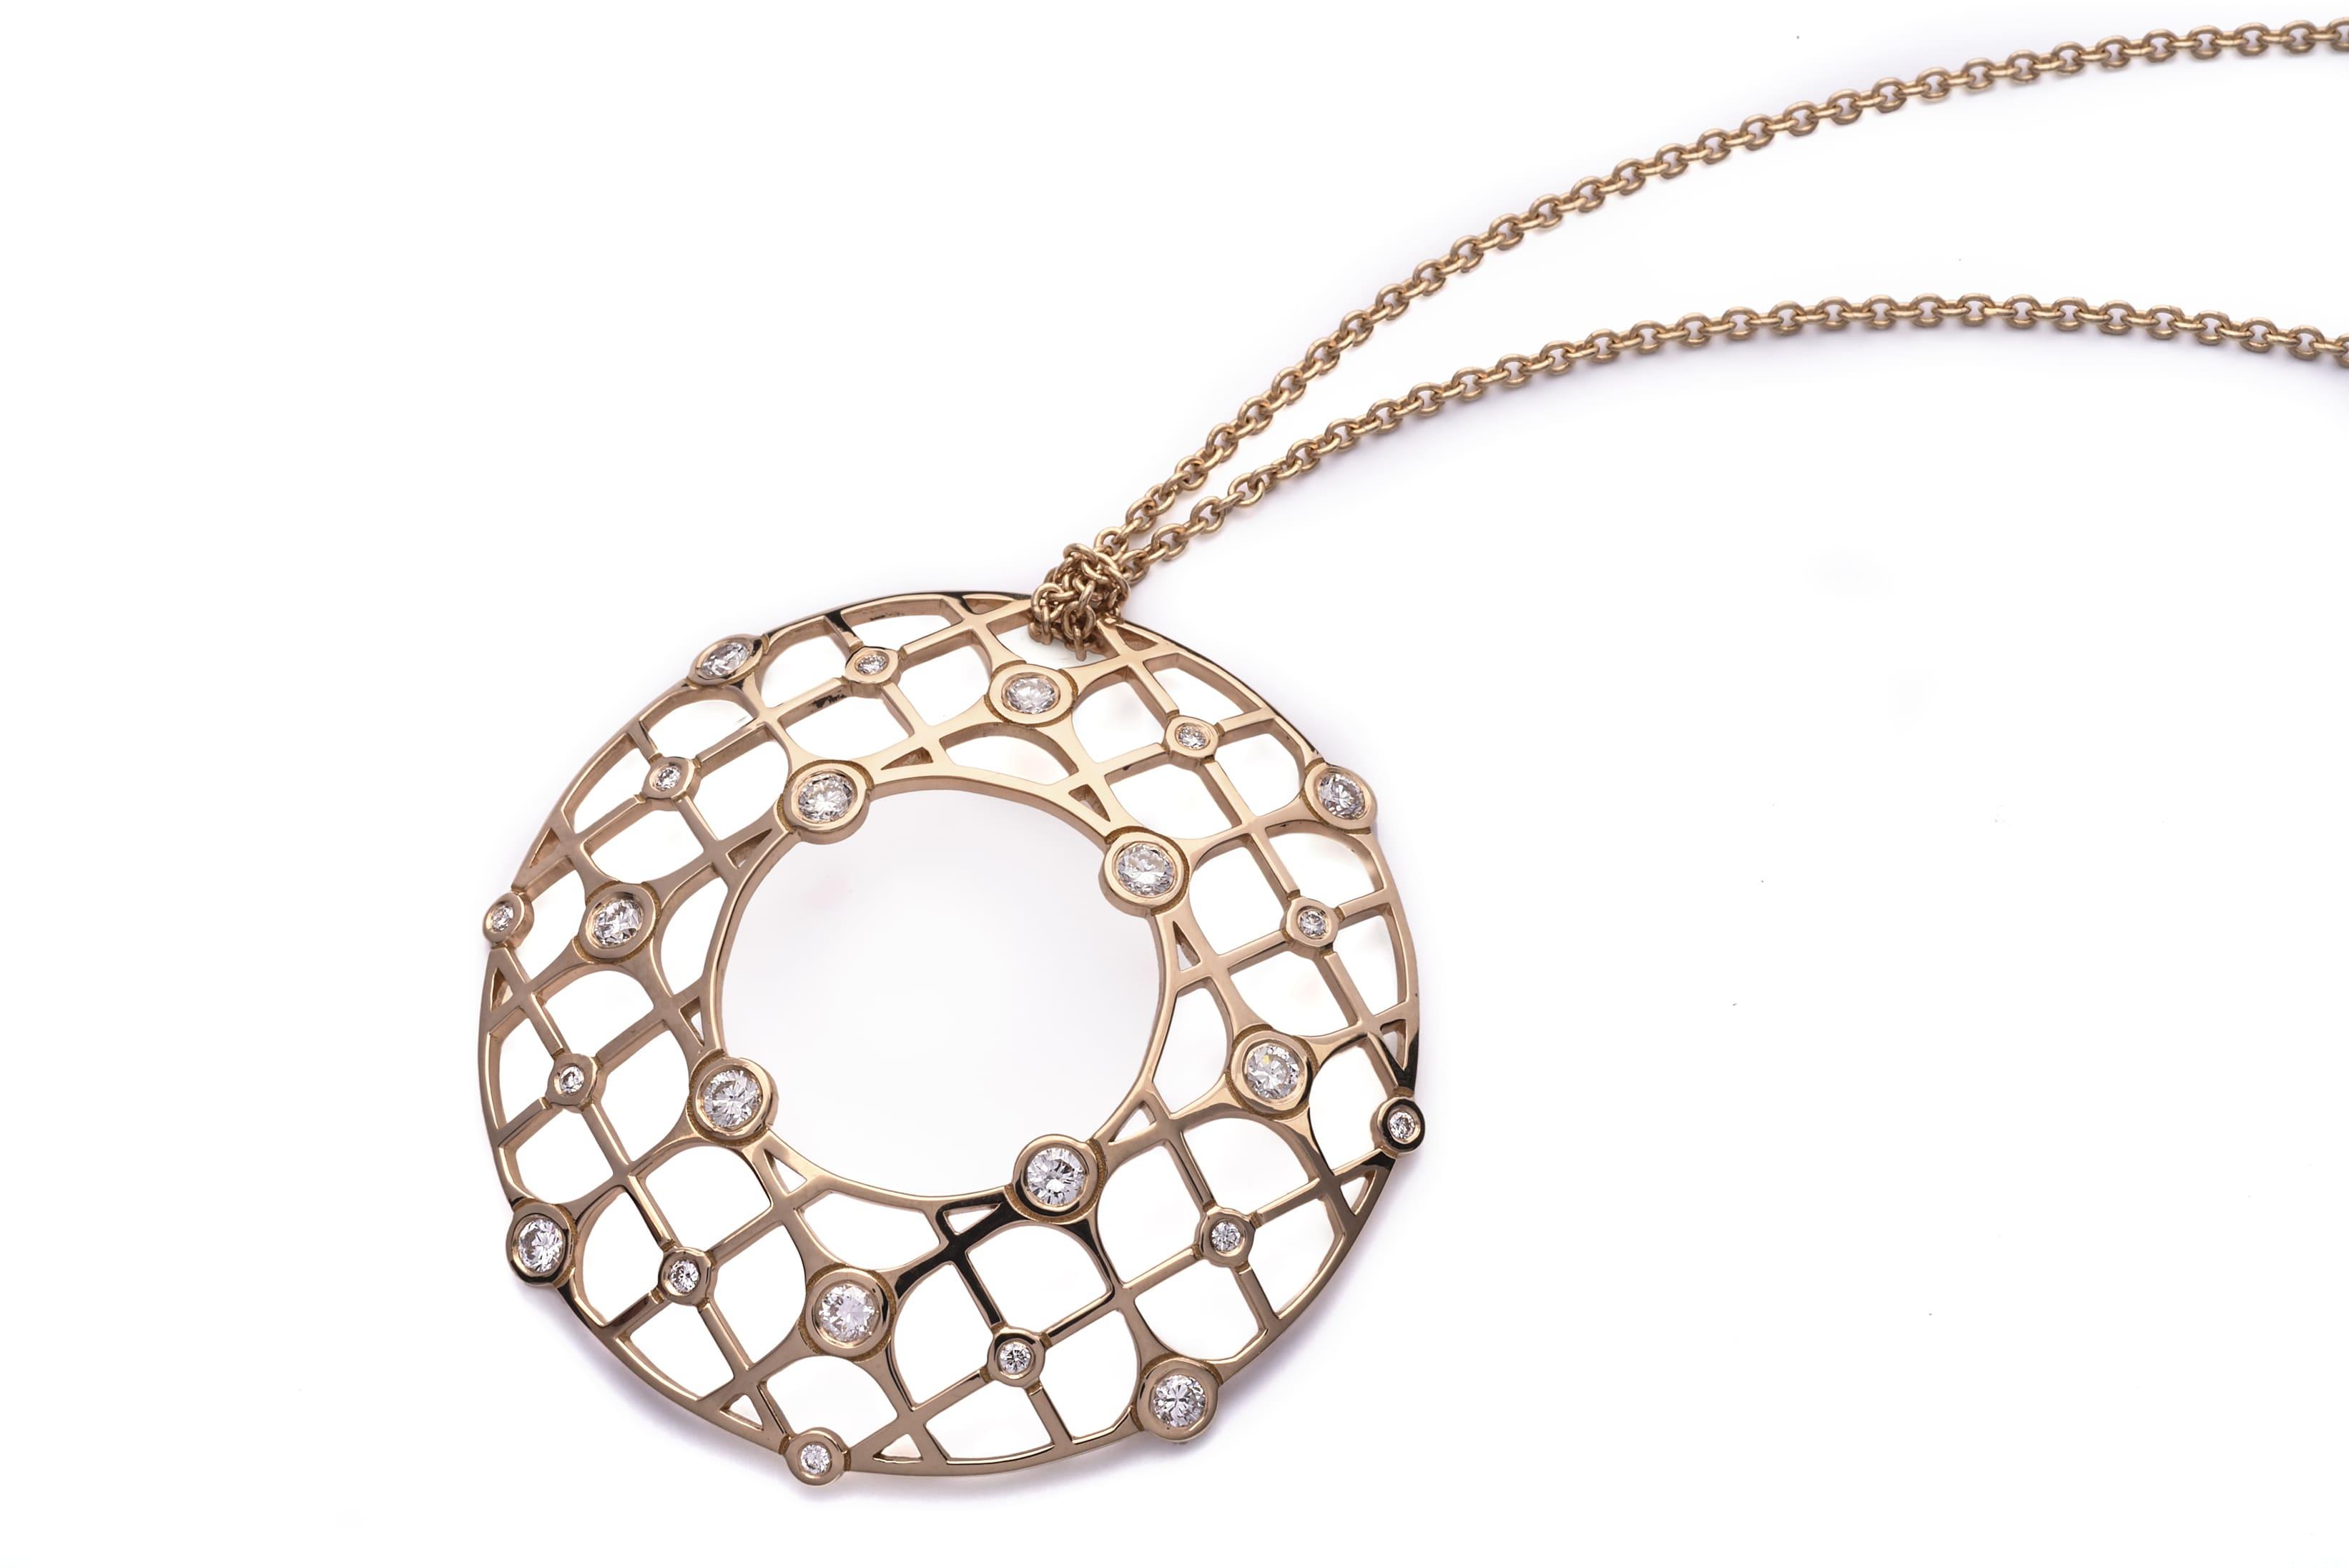 colgantes de oro y diamantes_ramon jewellers (3)